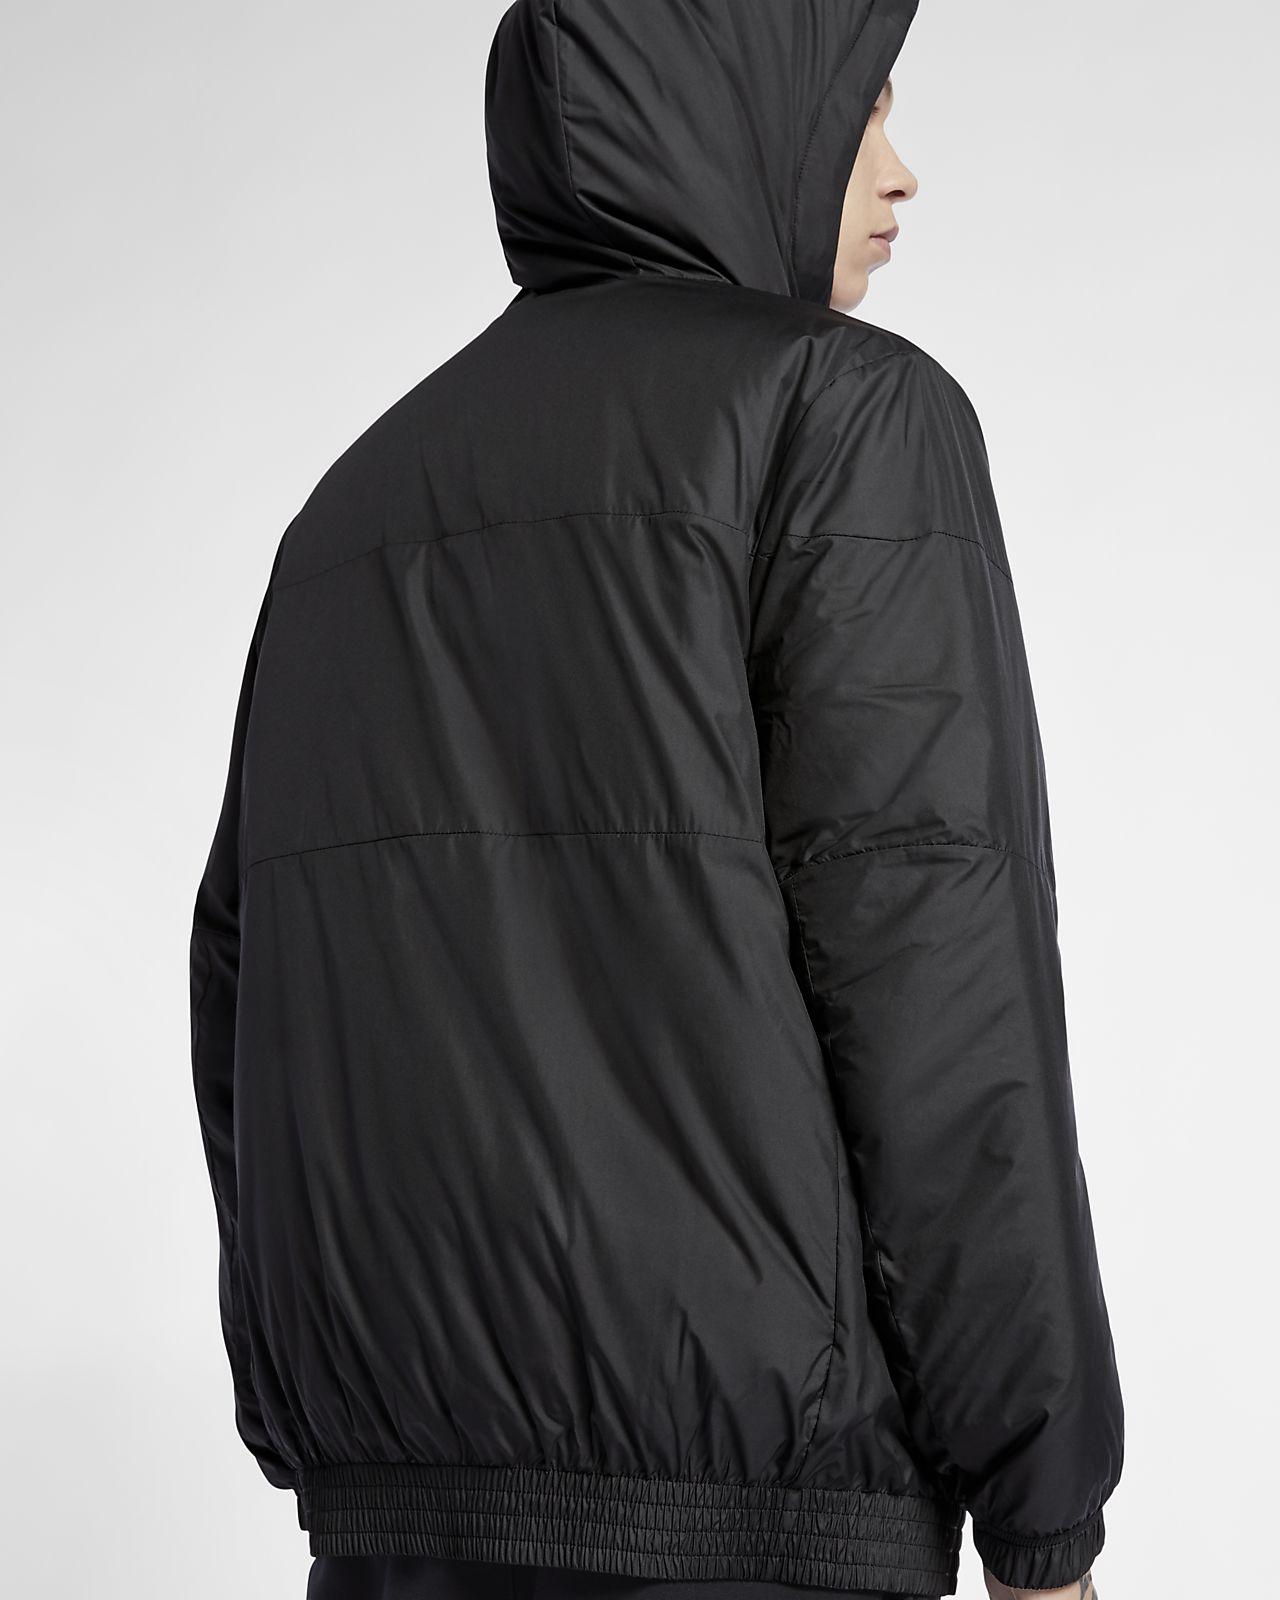 3d79e161 Мужская куртка с капюшоном Nike Sportswear Synthetic Fill. Nike.com RU